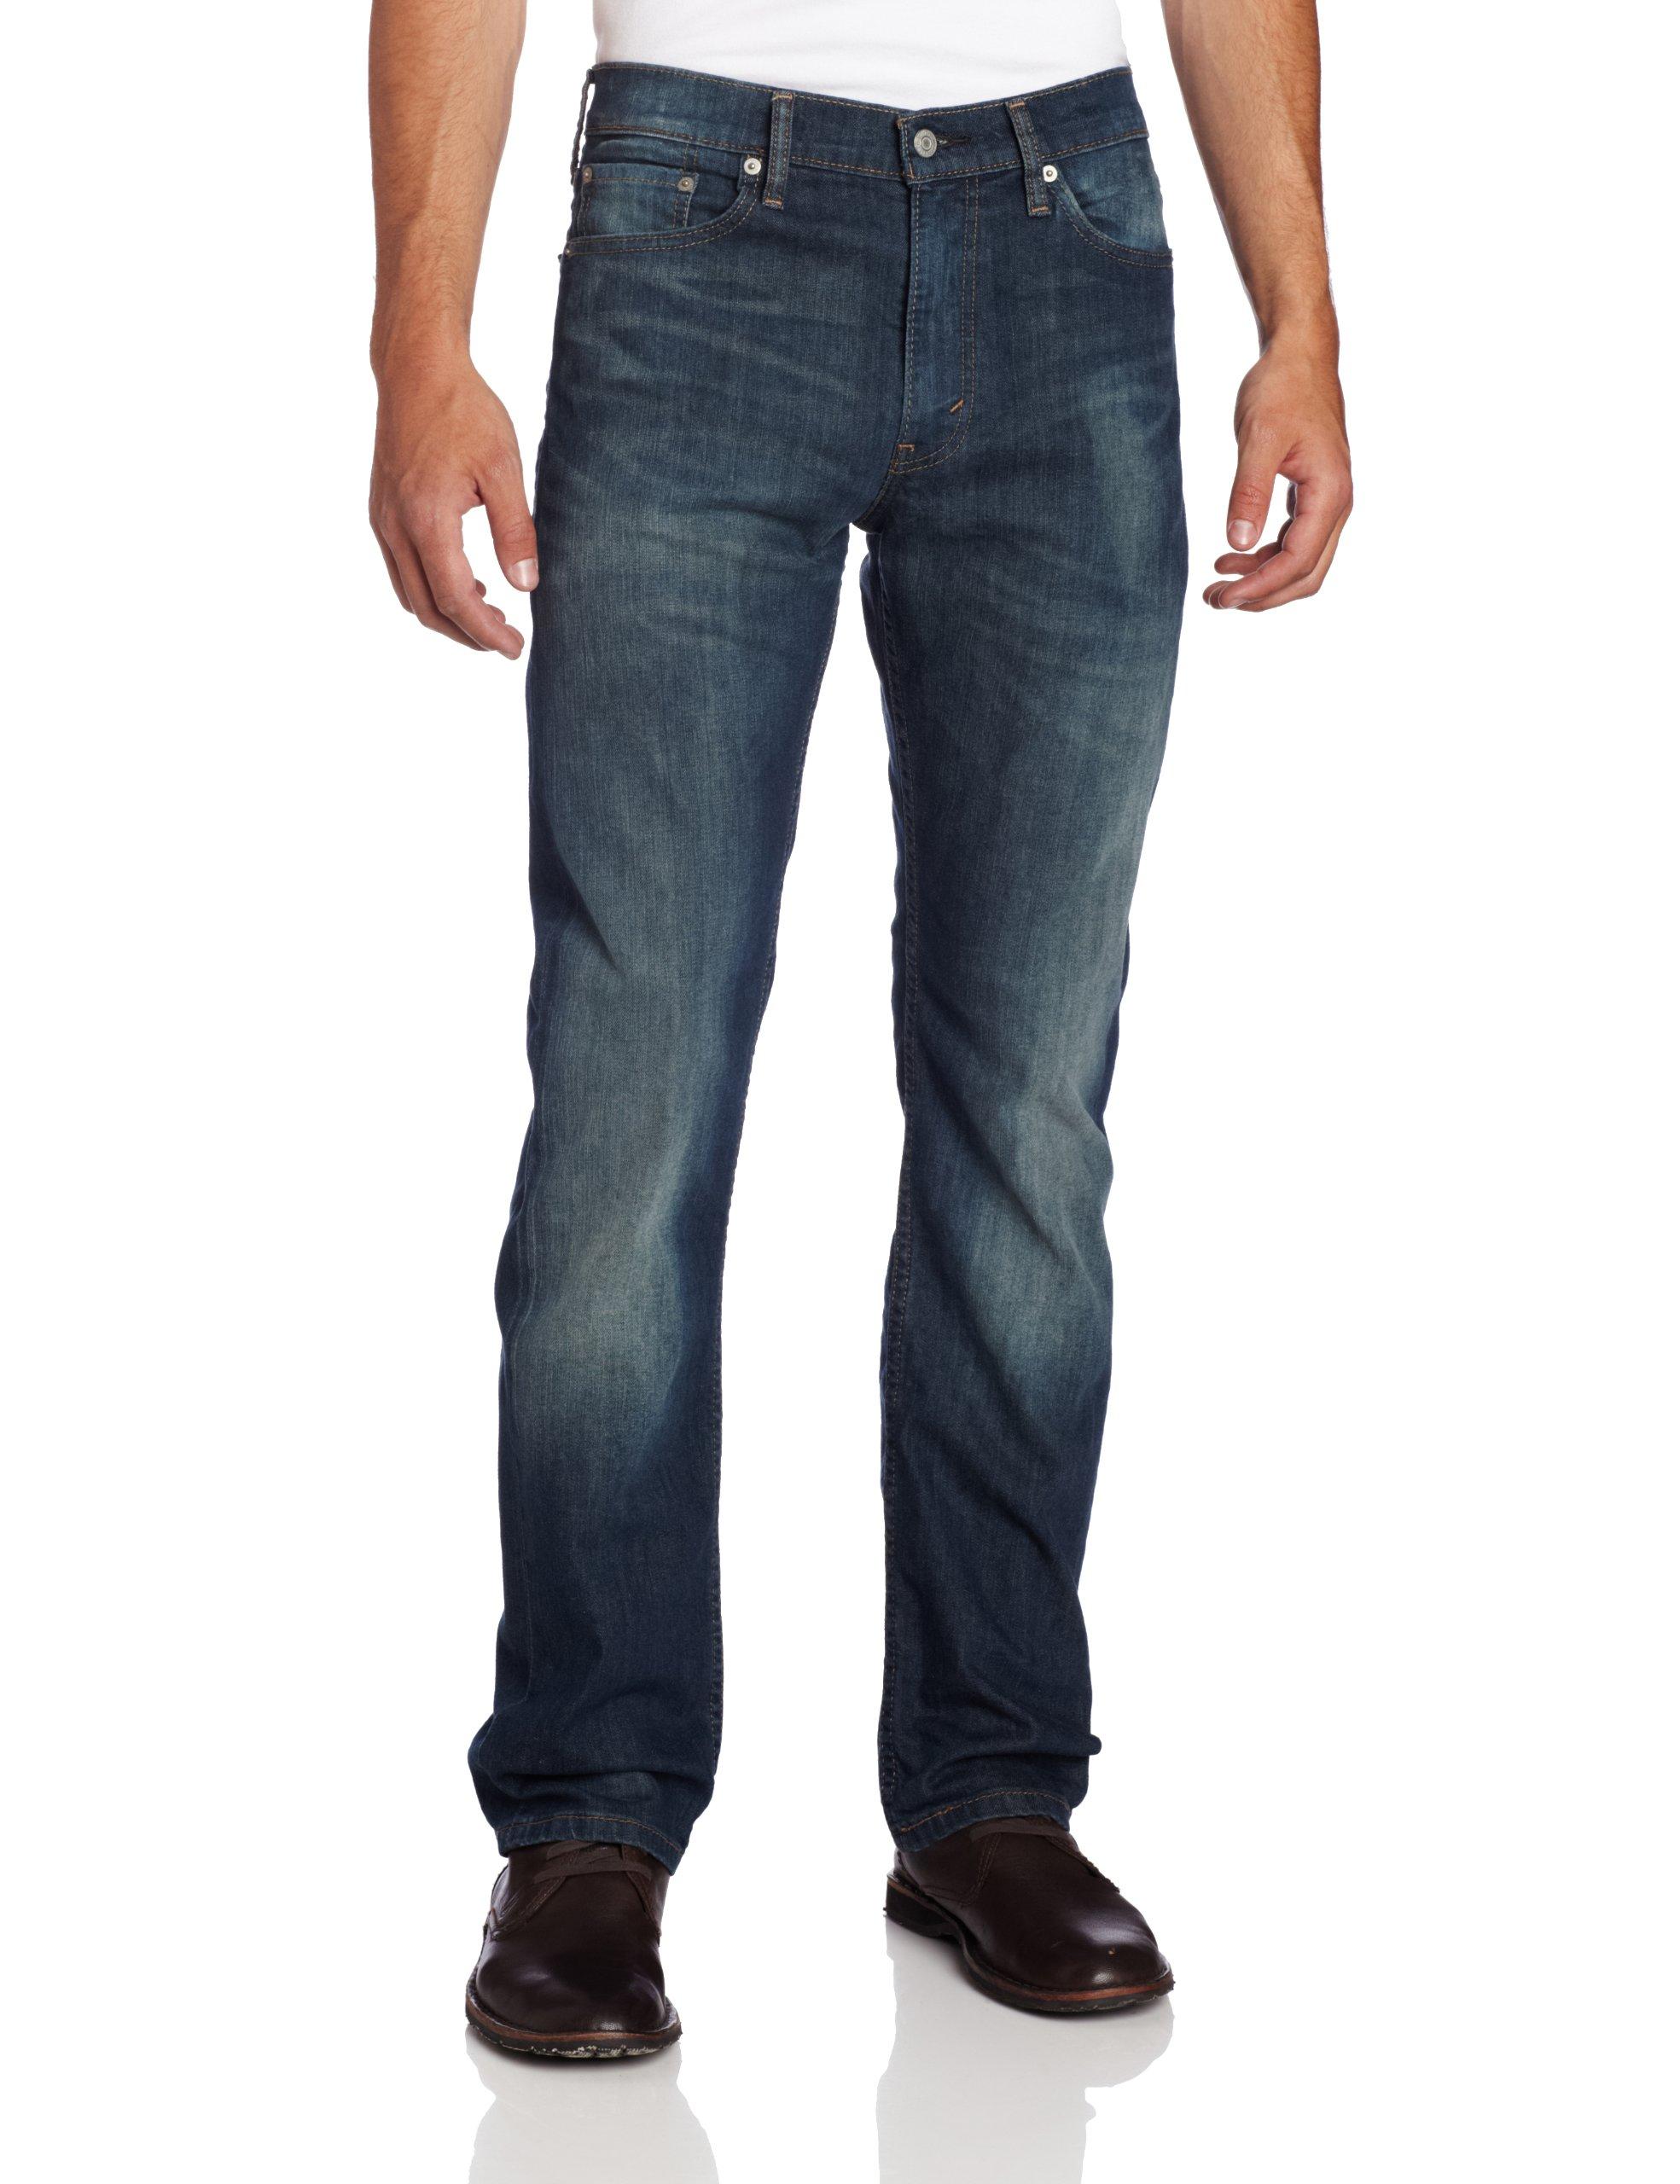 d7c458caa91a01 Levi's Men's 513 Stretch Slim Straight Jean, Cash, 30x30 - 85130200 ...